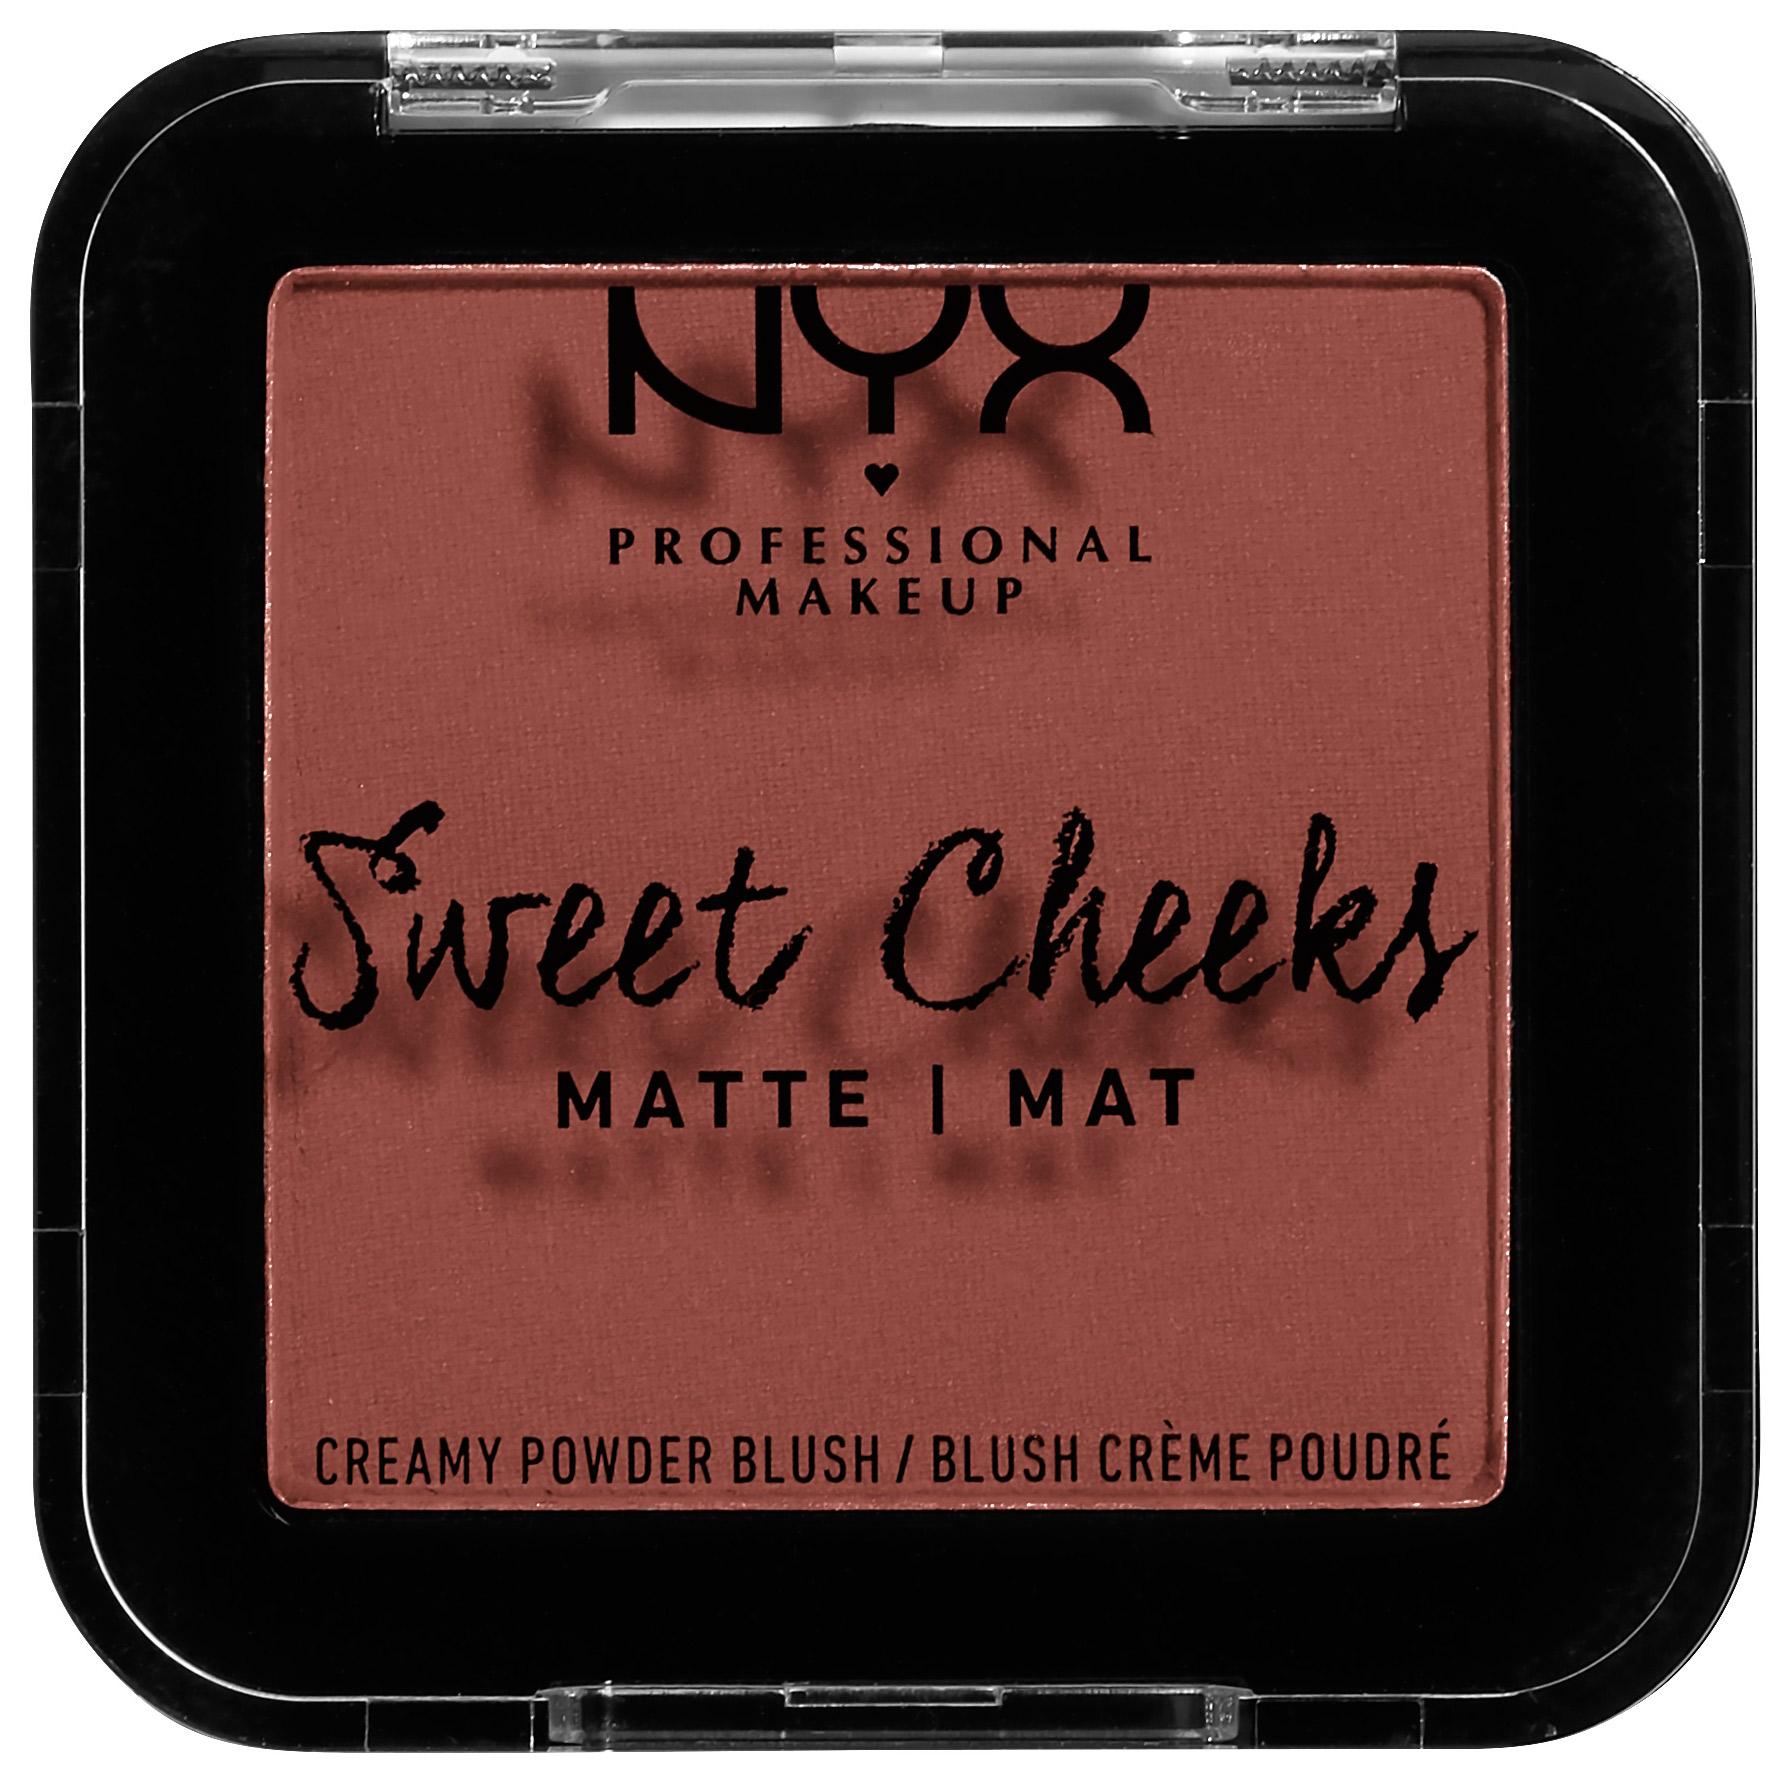 Nyx Sweet Cheeks Creamy Powder Blush Matte